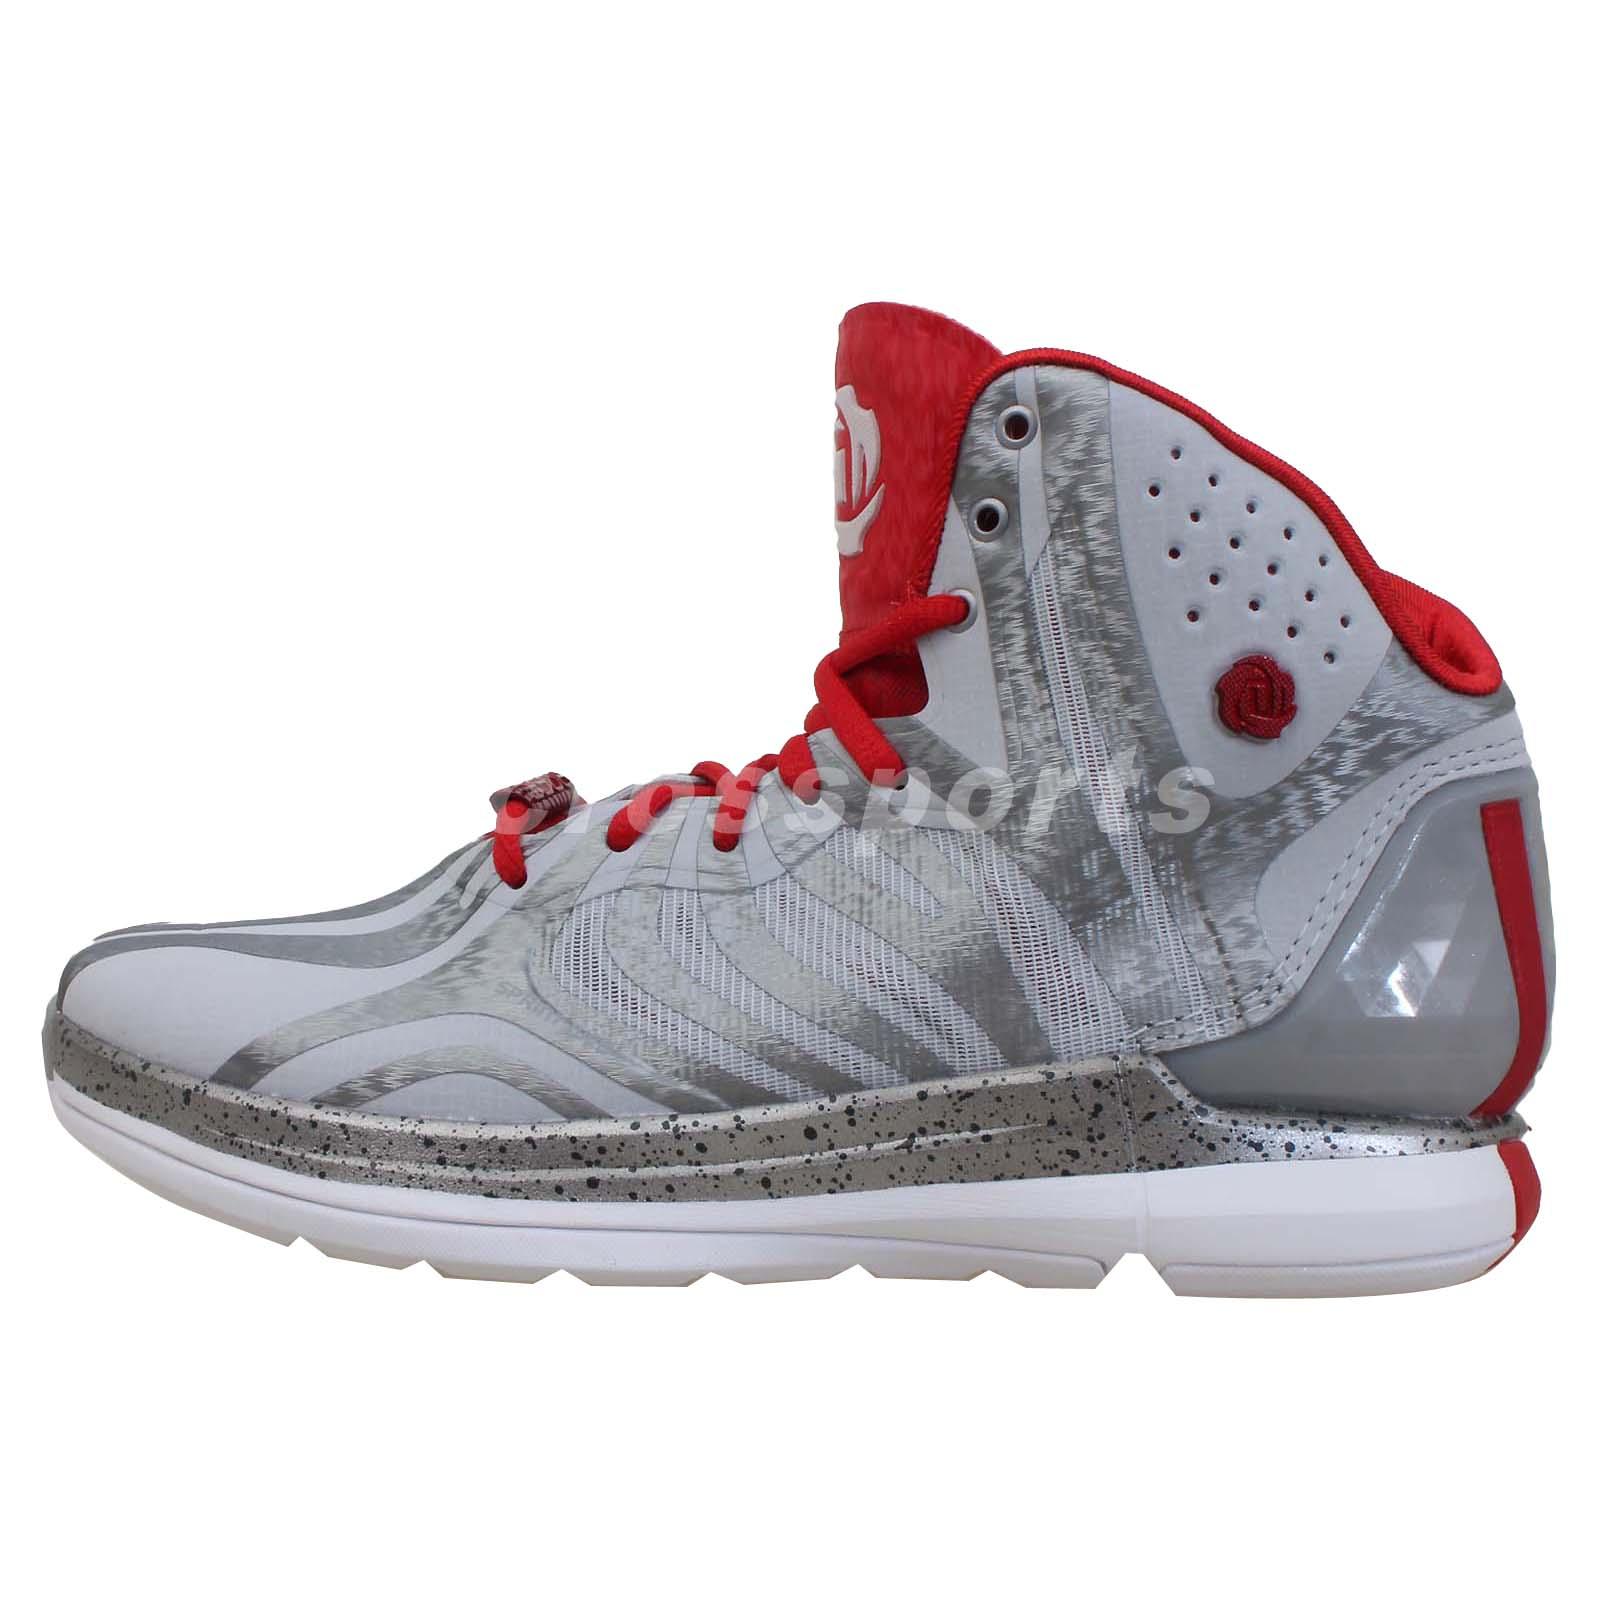 Adidas D Rose 4.5 J Derrick Tiger Chicago 2014 Youth Boys ...